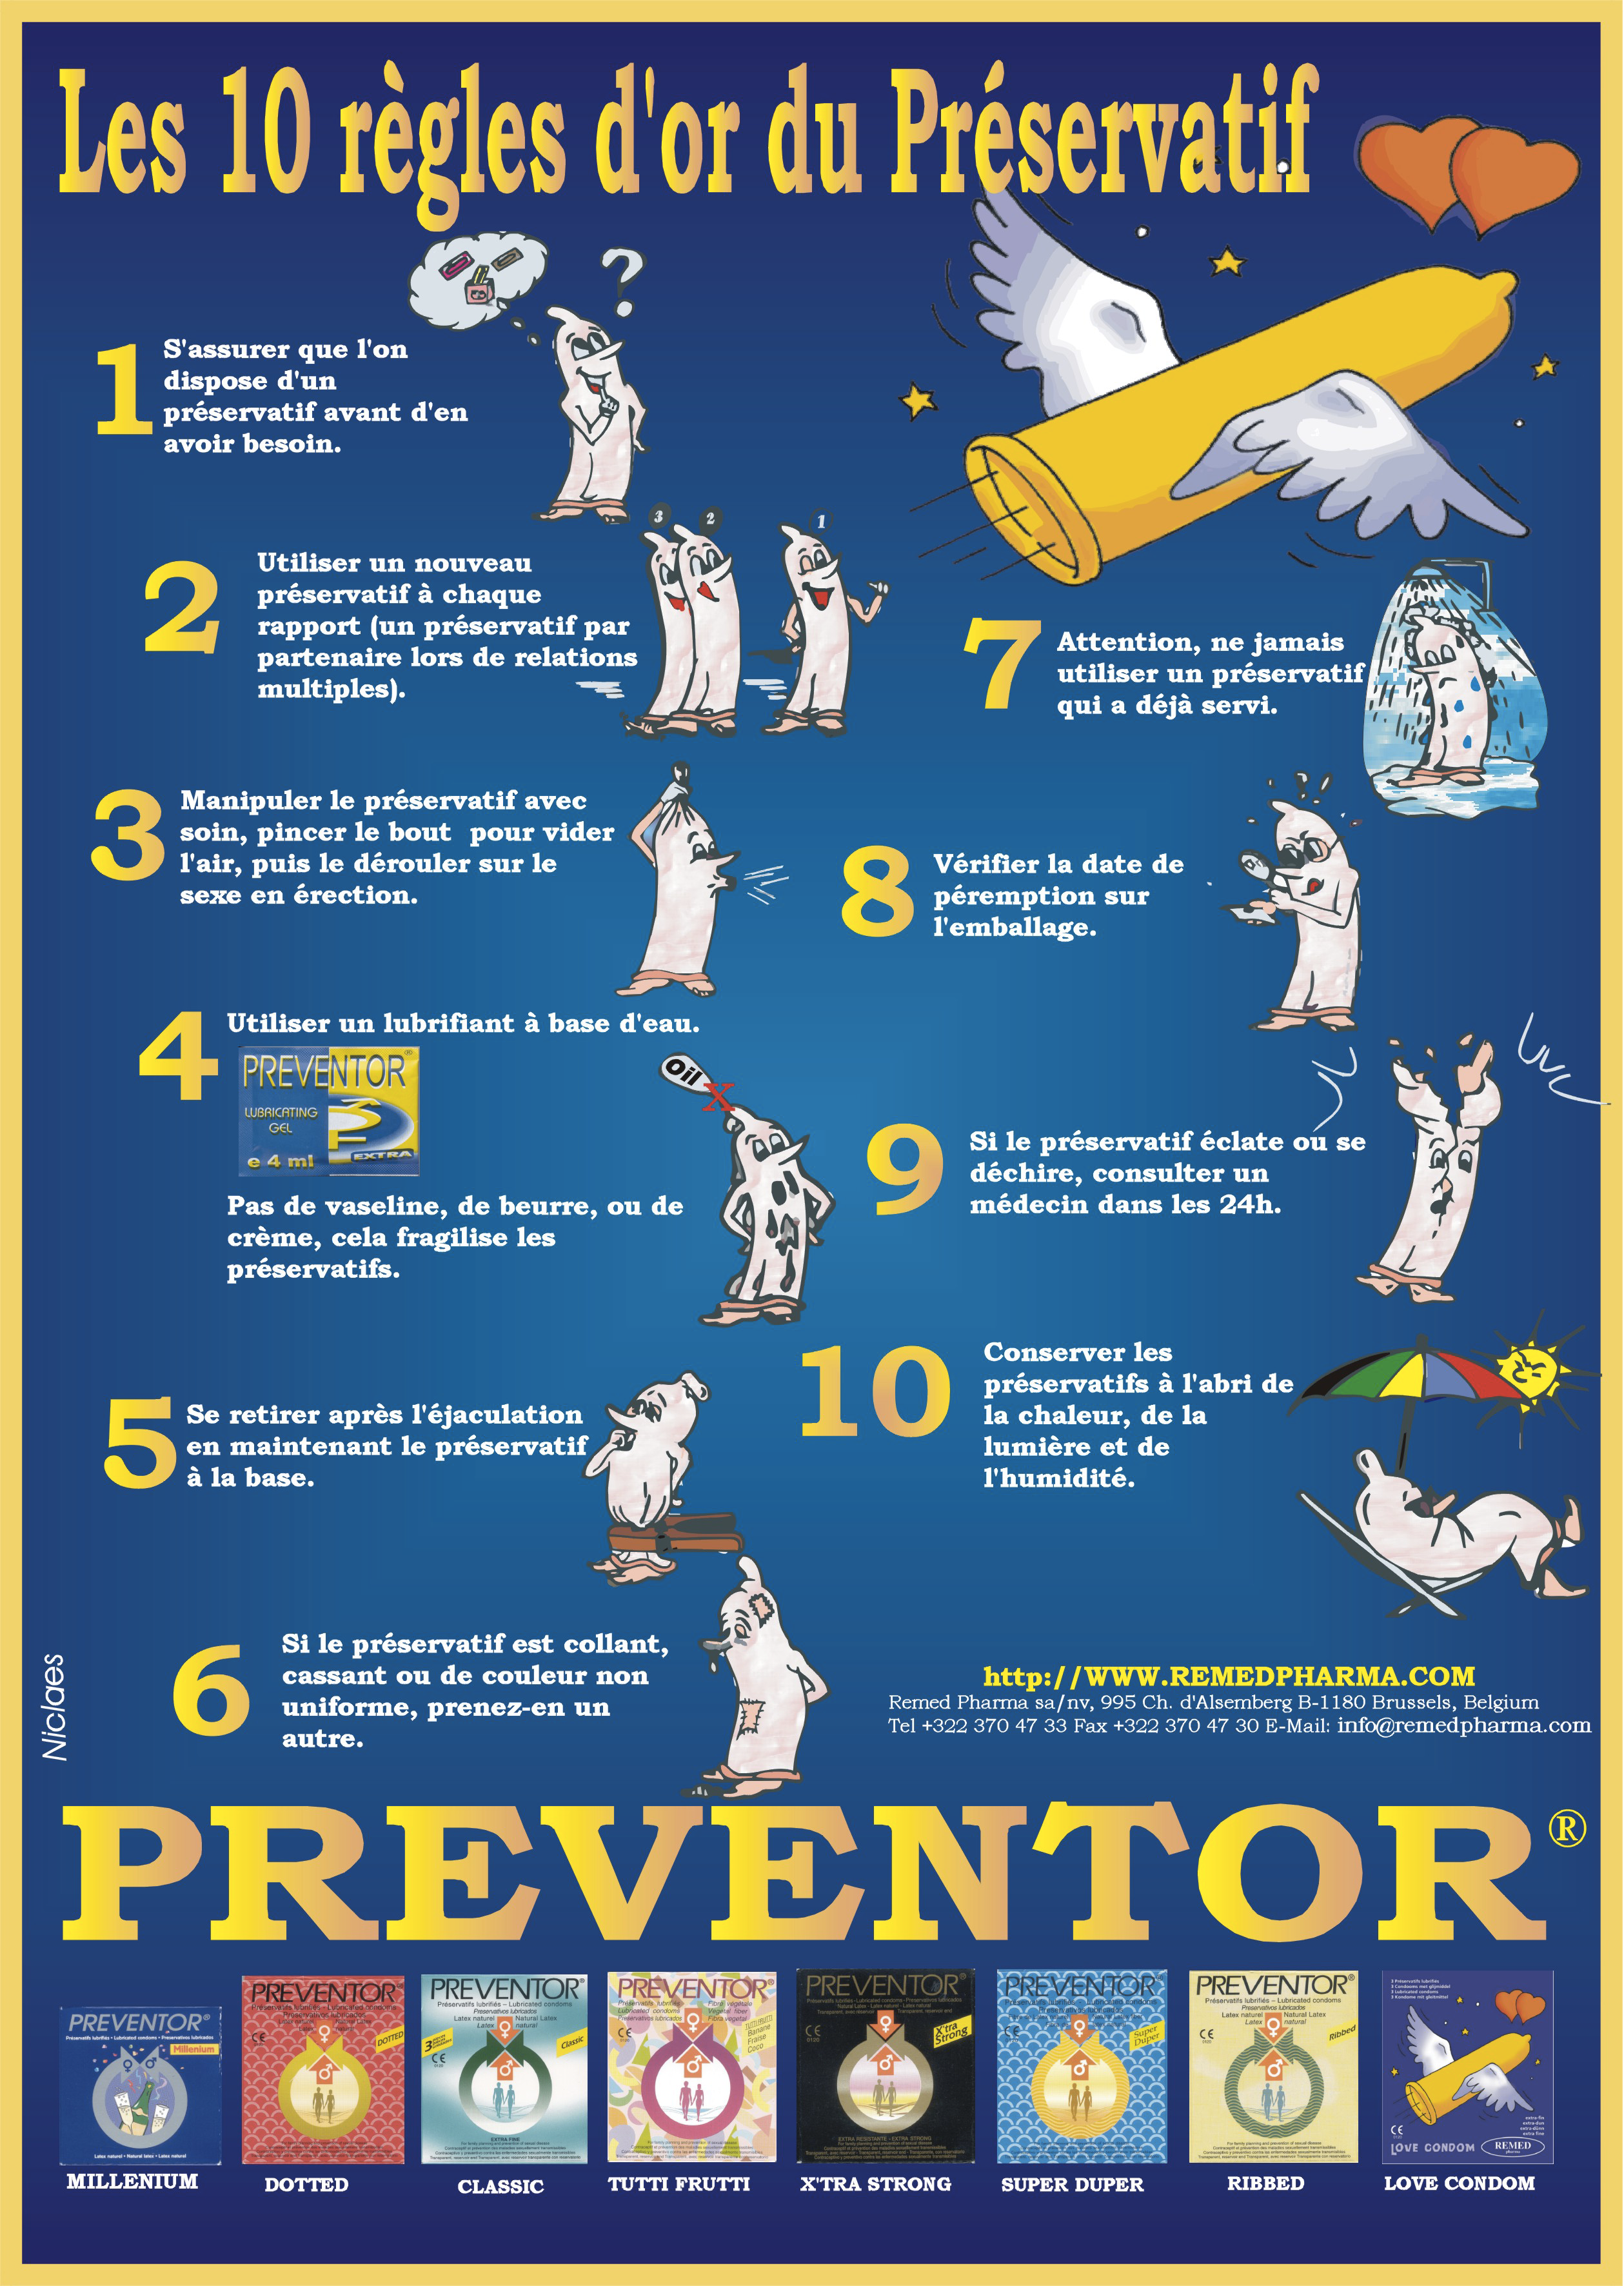 Preventor® - Les 10 règles d'or